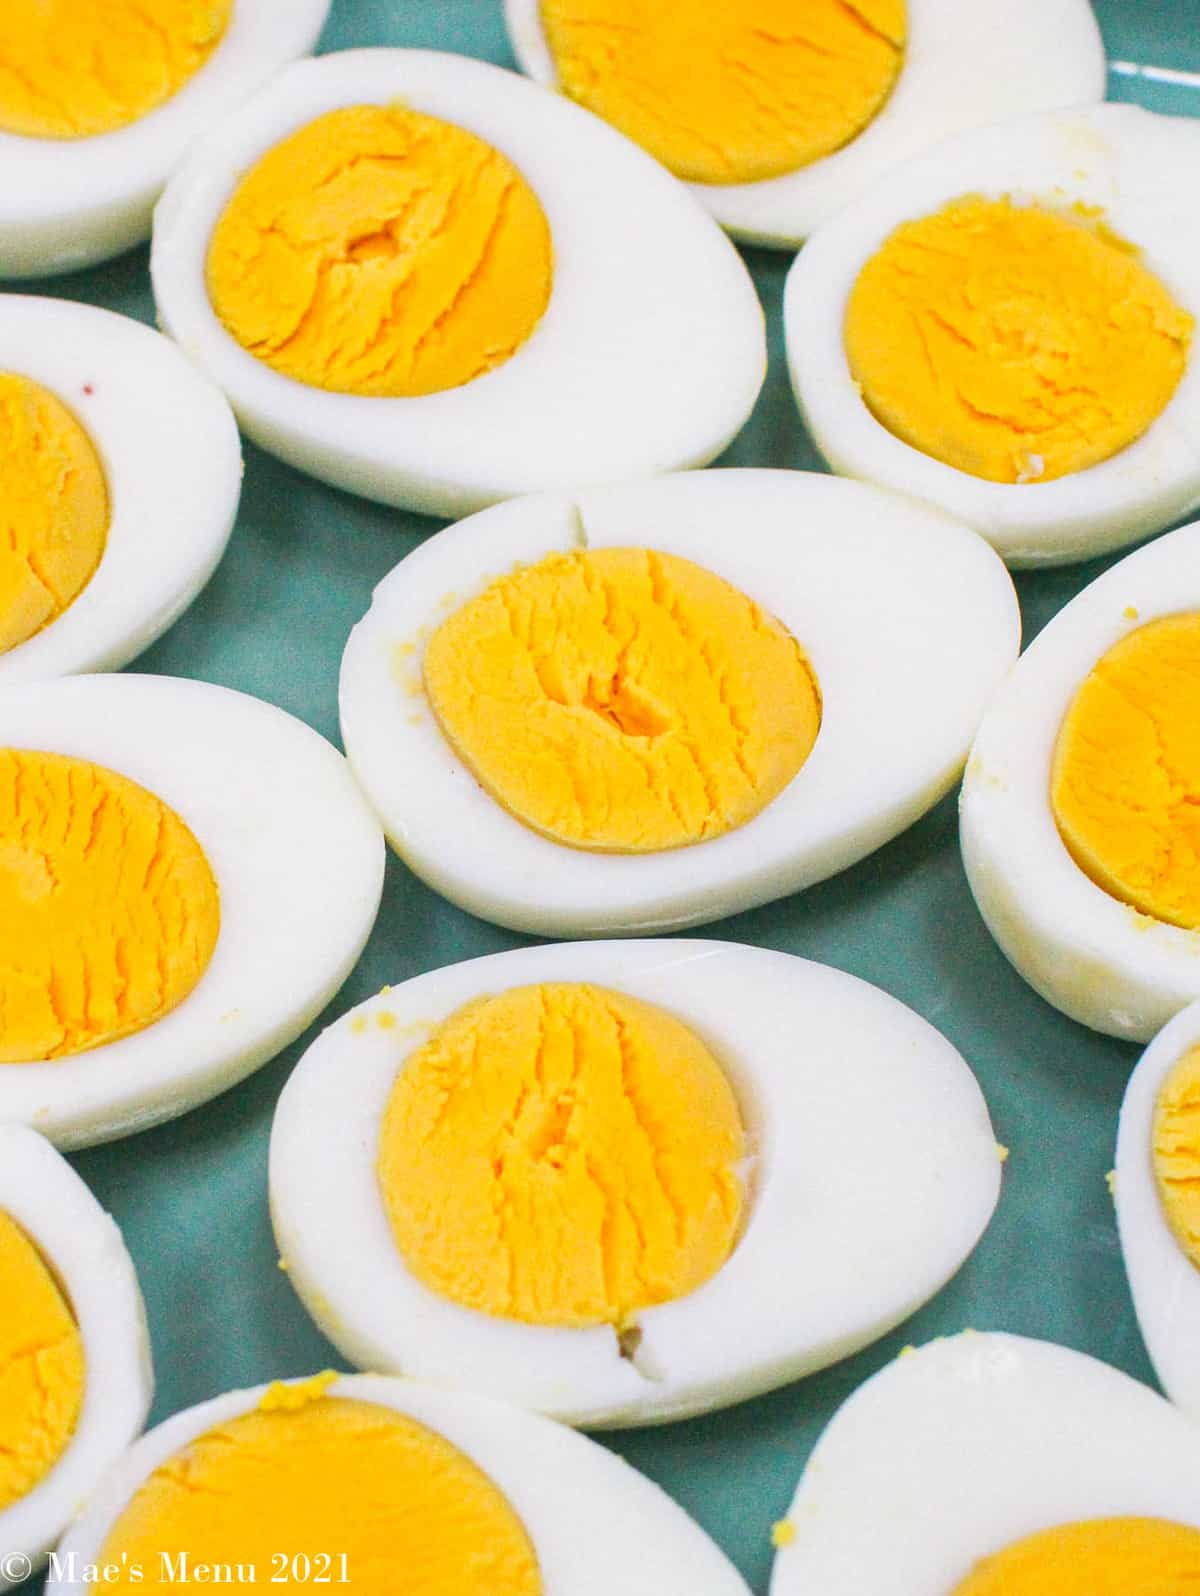 An overhead shot of hard boiled eggs cut length-wise